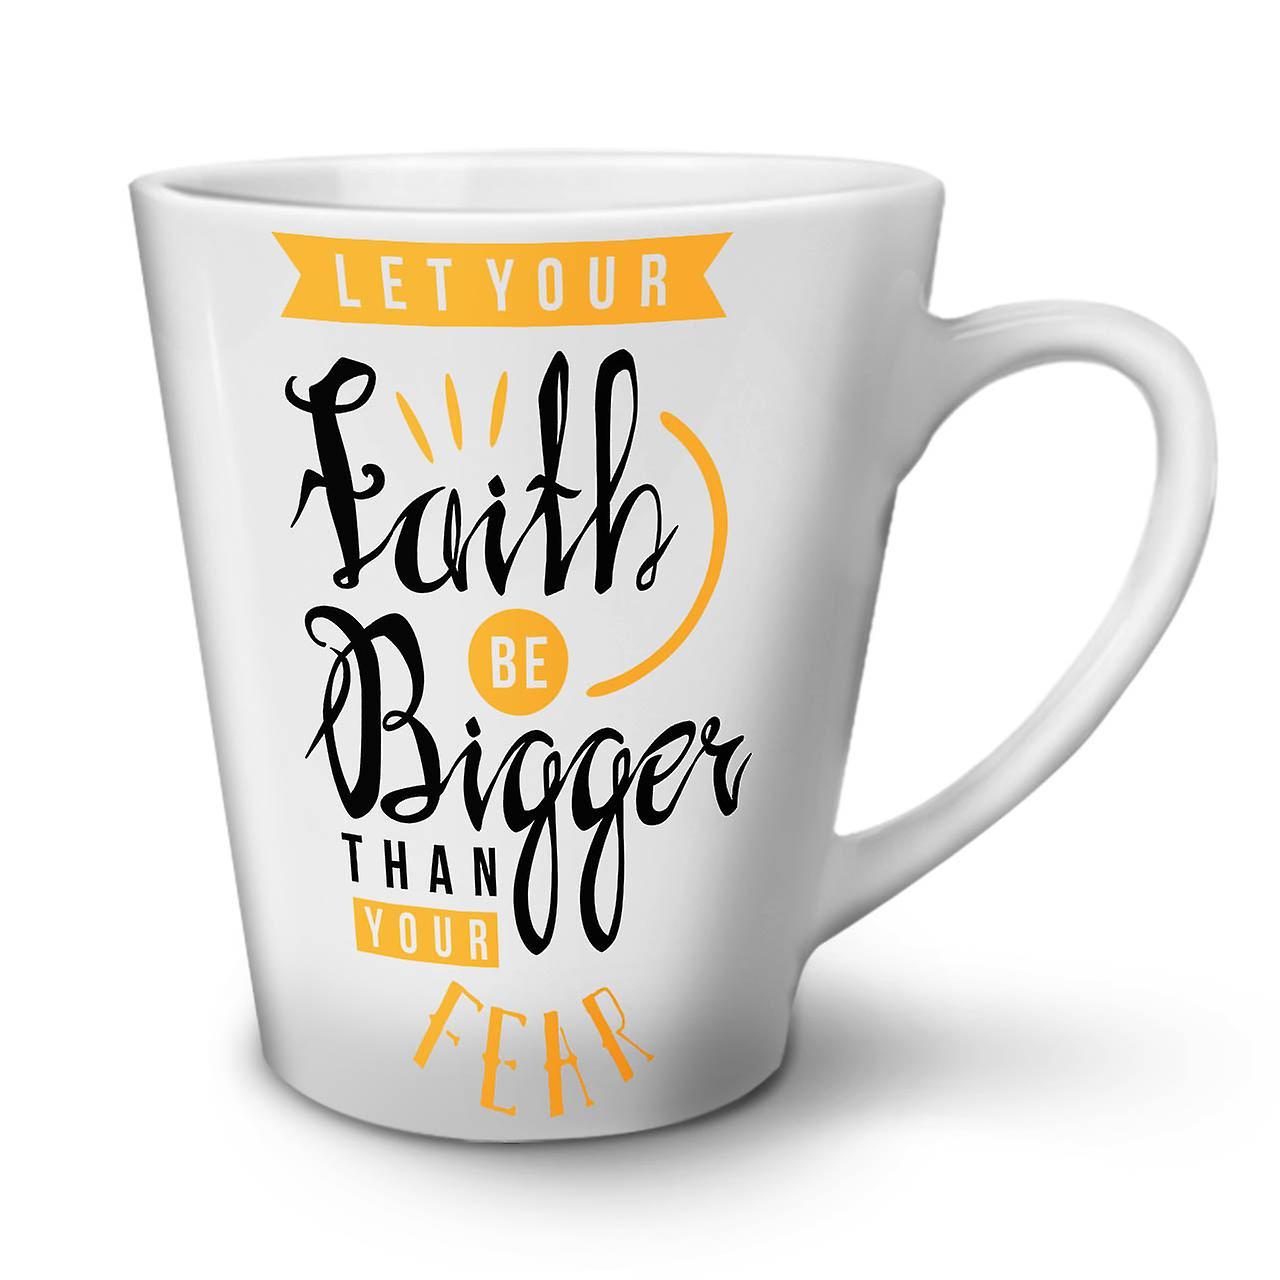 Foi Plus Latte Nouveau Grande Slogan Blanc En Céramique Peur 12 OzWellcoda Mug Thé Café 8vyNOPwmn0